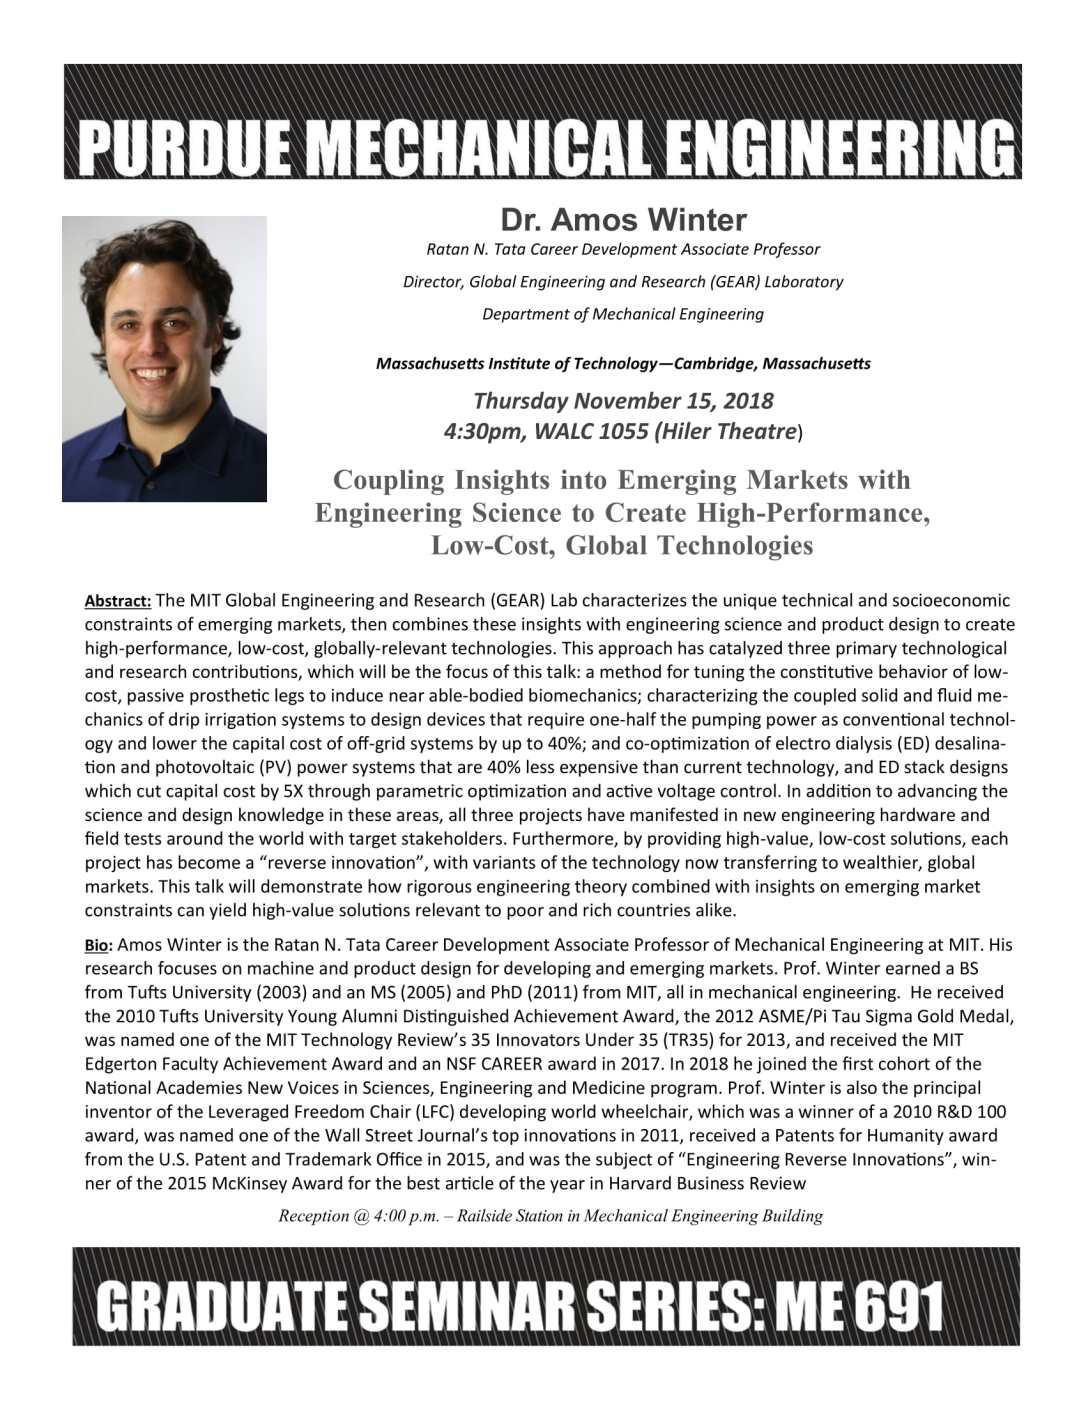 Seminar Announcement Amos Winter-1